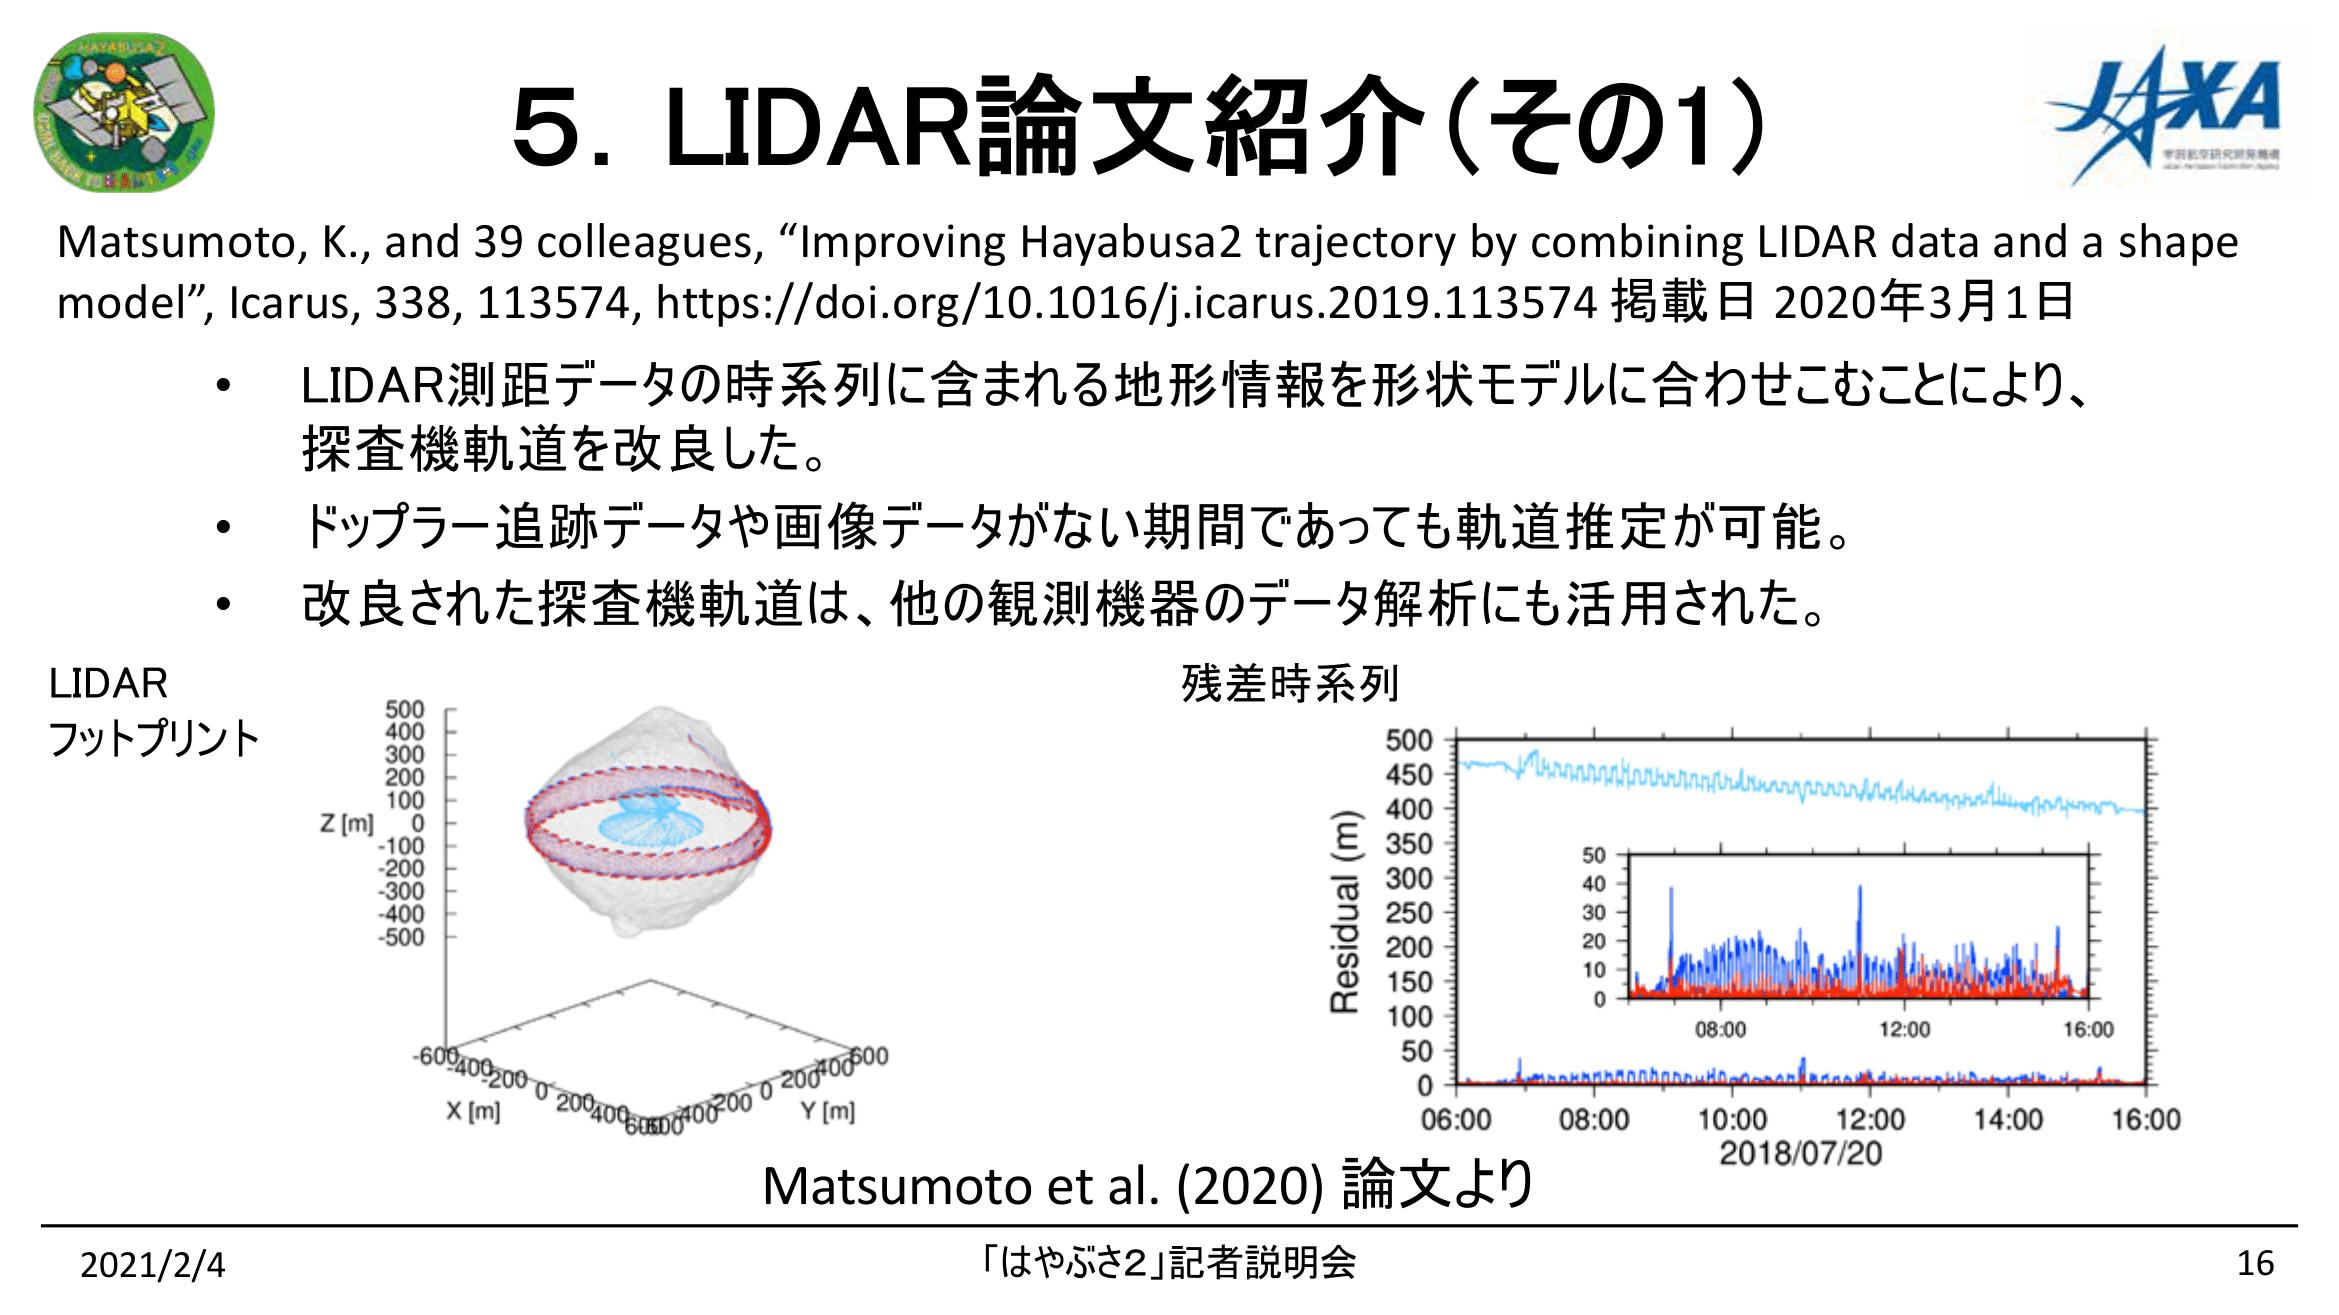 f:id:Imamura:20210204134358p:plain